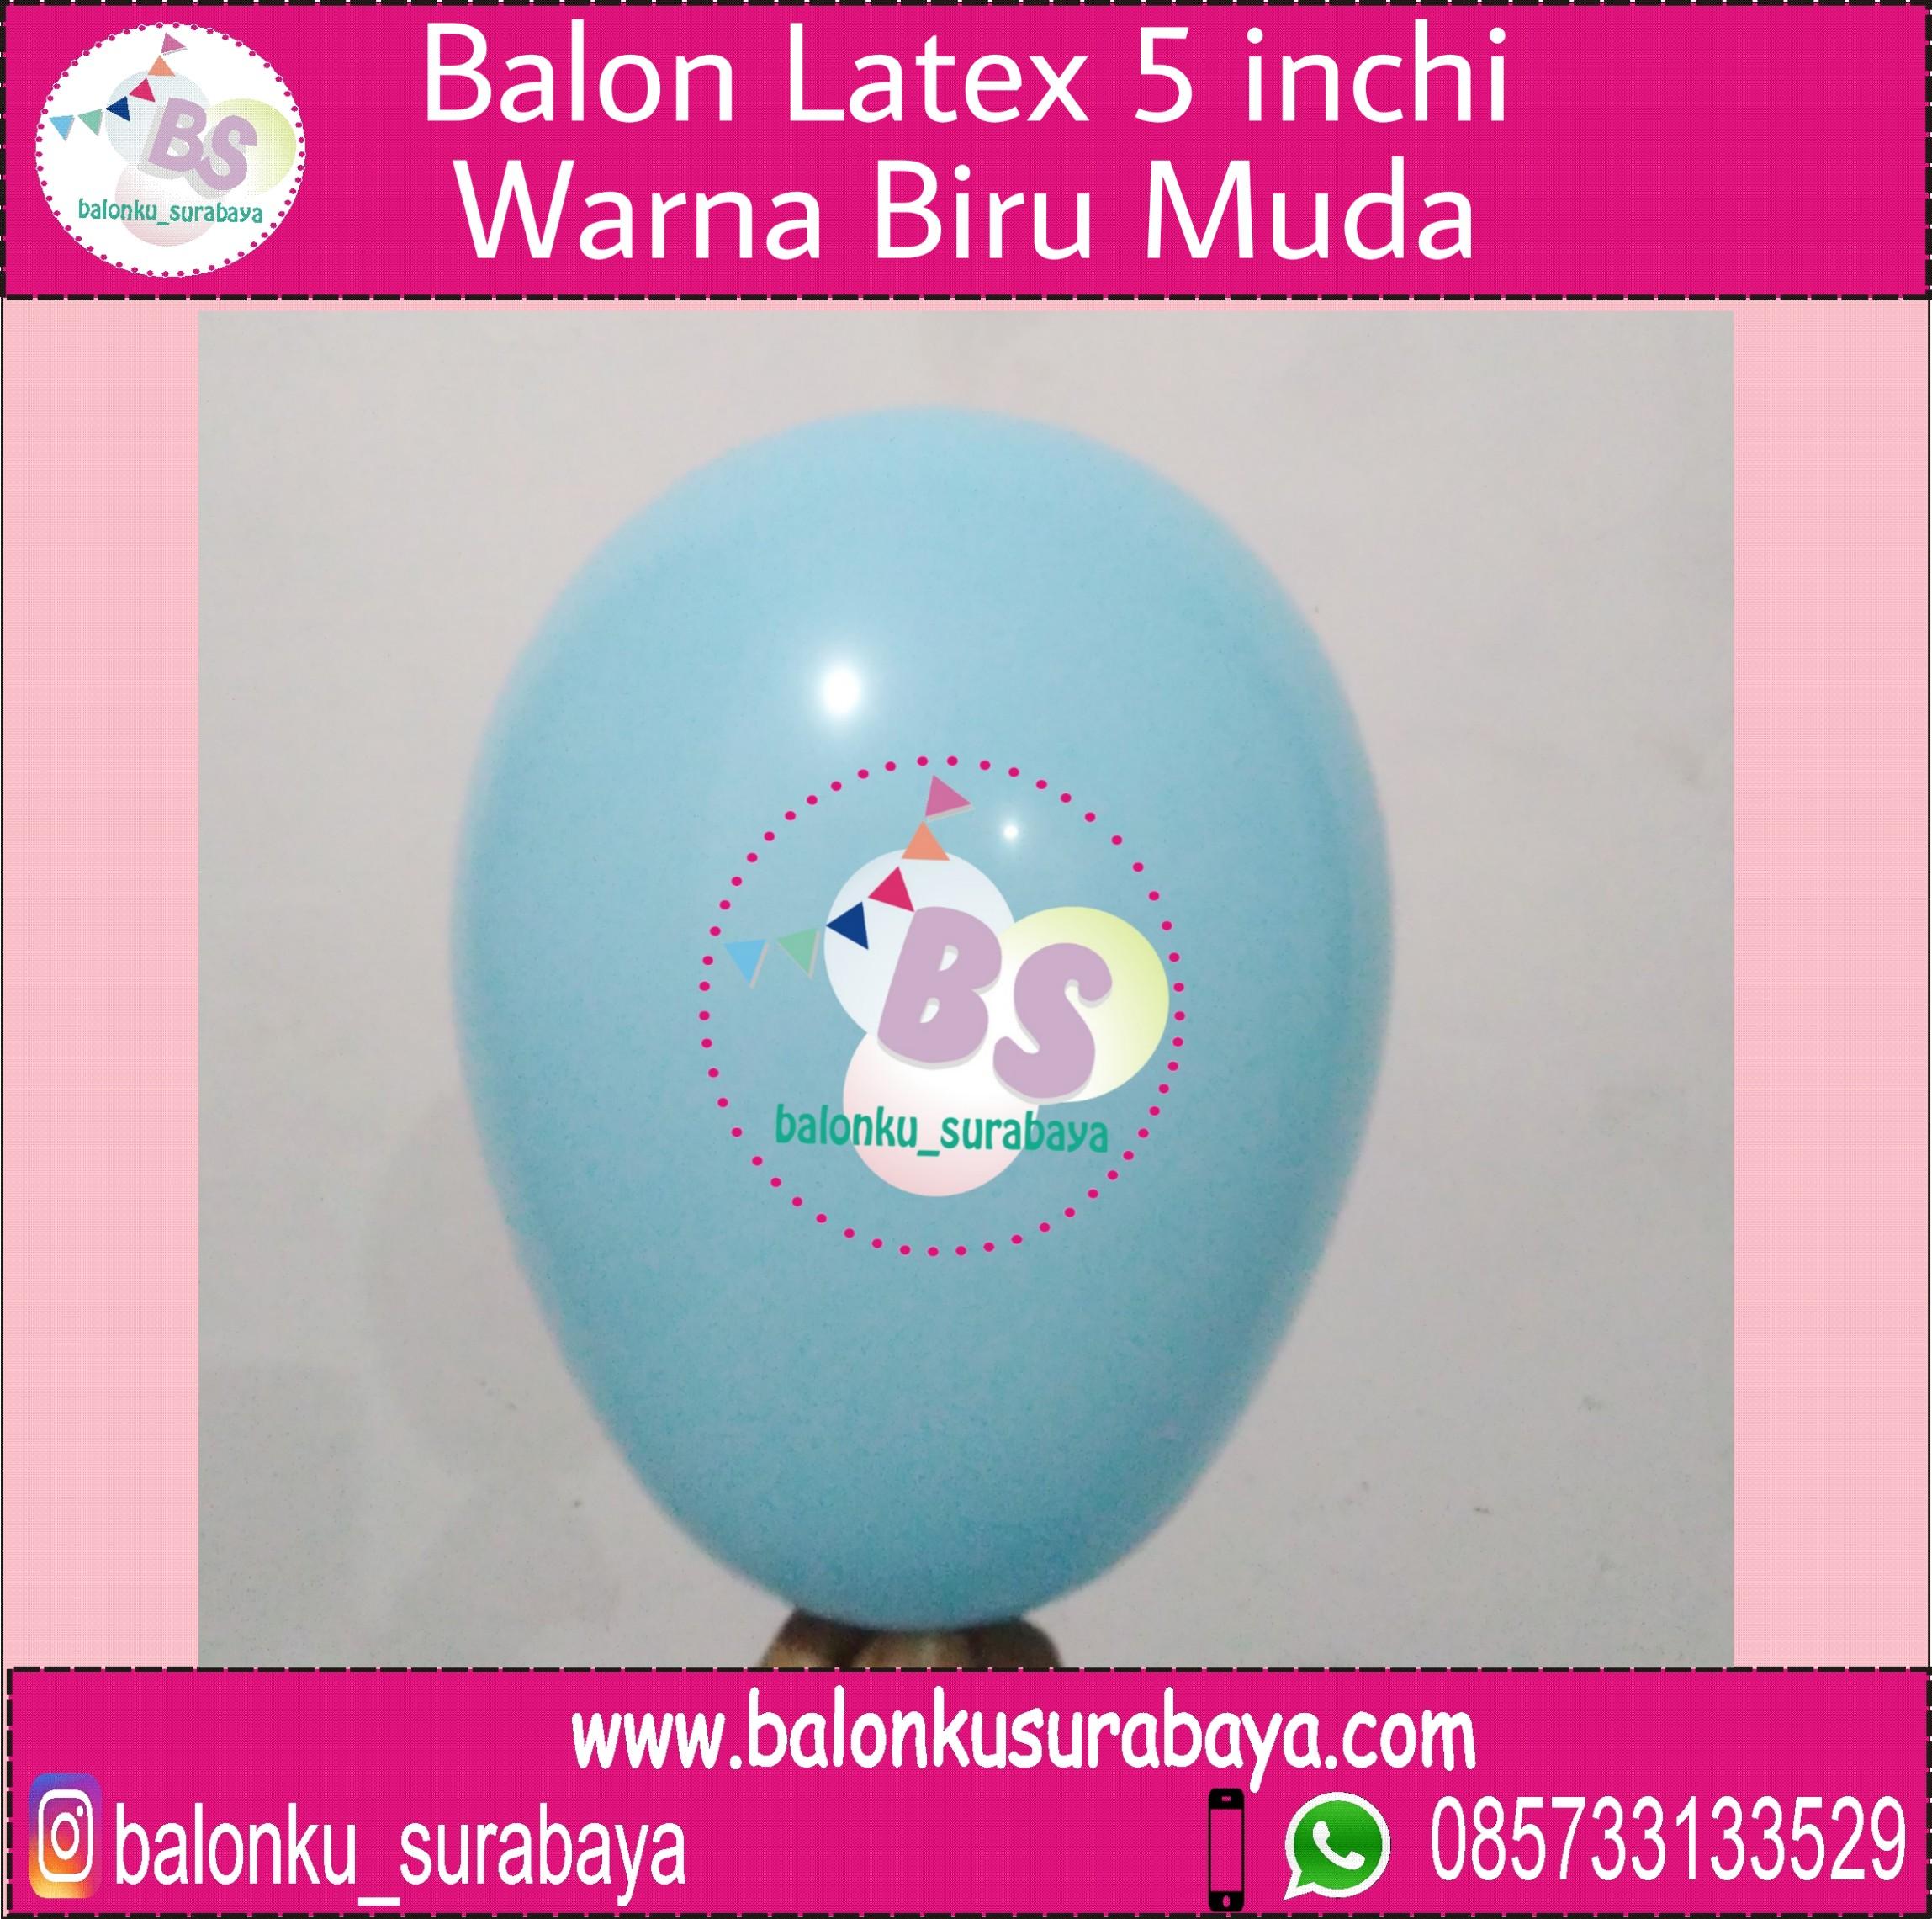 jual balon latex 5 inch biru muda, BAlon Gas,Bunga dekorasi,Rangkaian bunga artificial, Buket bunga, buket bunga mawar, harga buket bunga,Balon sablon, balon Printing, balon promosi, , Perlengkapan ulang tahun, Balon latex , balon doff, balon latex, balon doff merah, balon natal, balon agustusan, balon dekorasi, balonku Surabaya, 085733133529